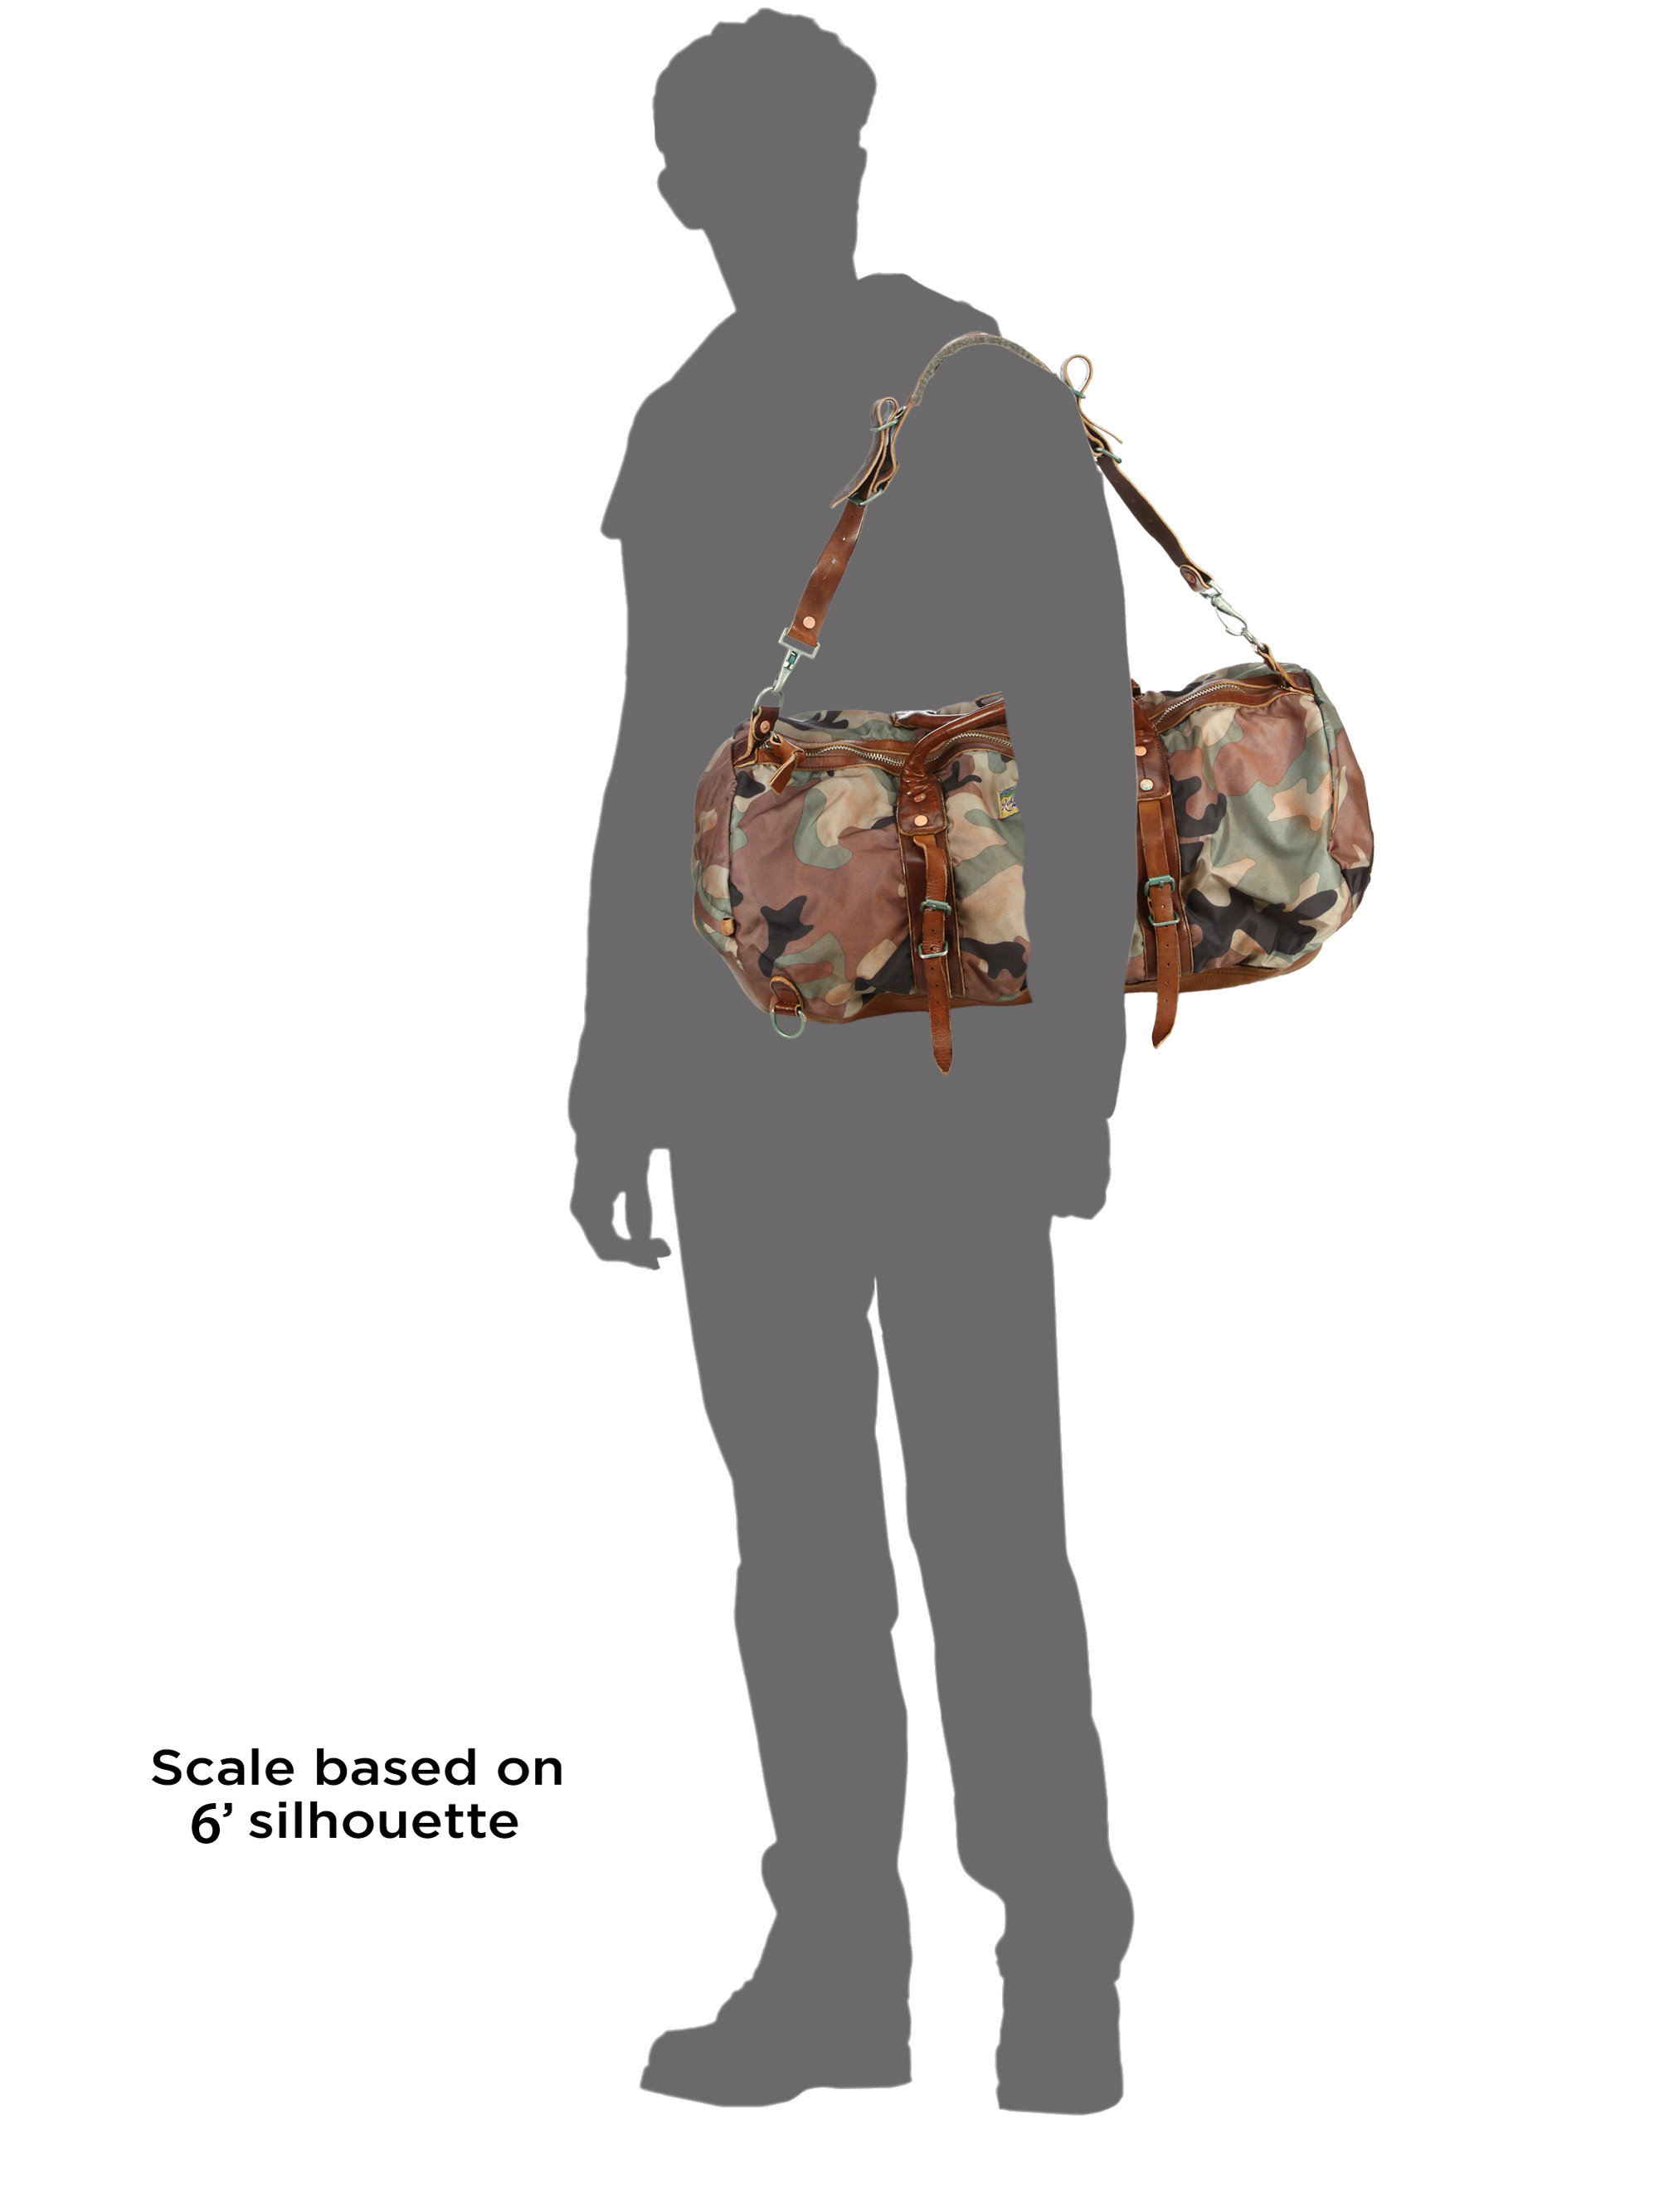 b09c92e8f55 Lyst - Polo Ralph Lauren Yosemite Nylon Duffel Bag in Green for Men